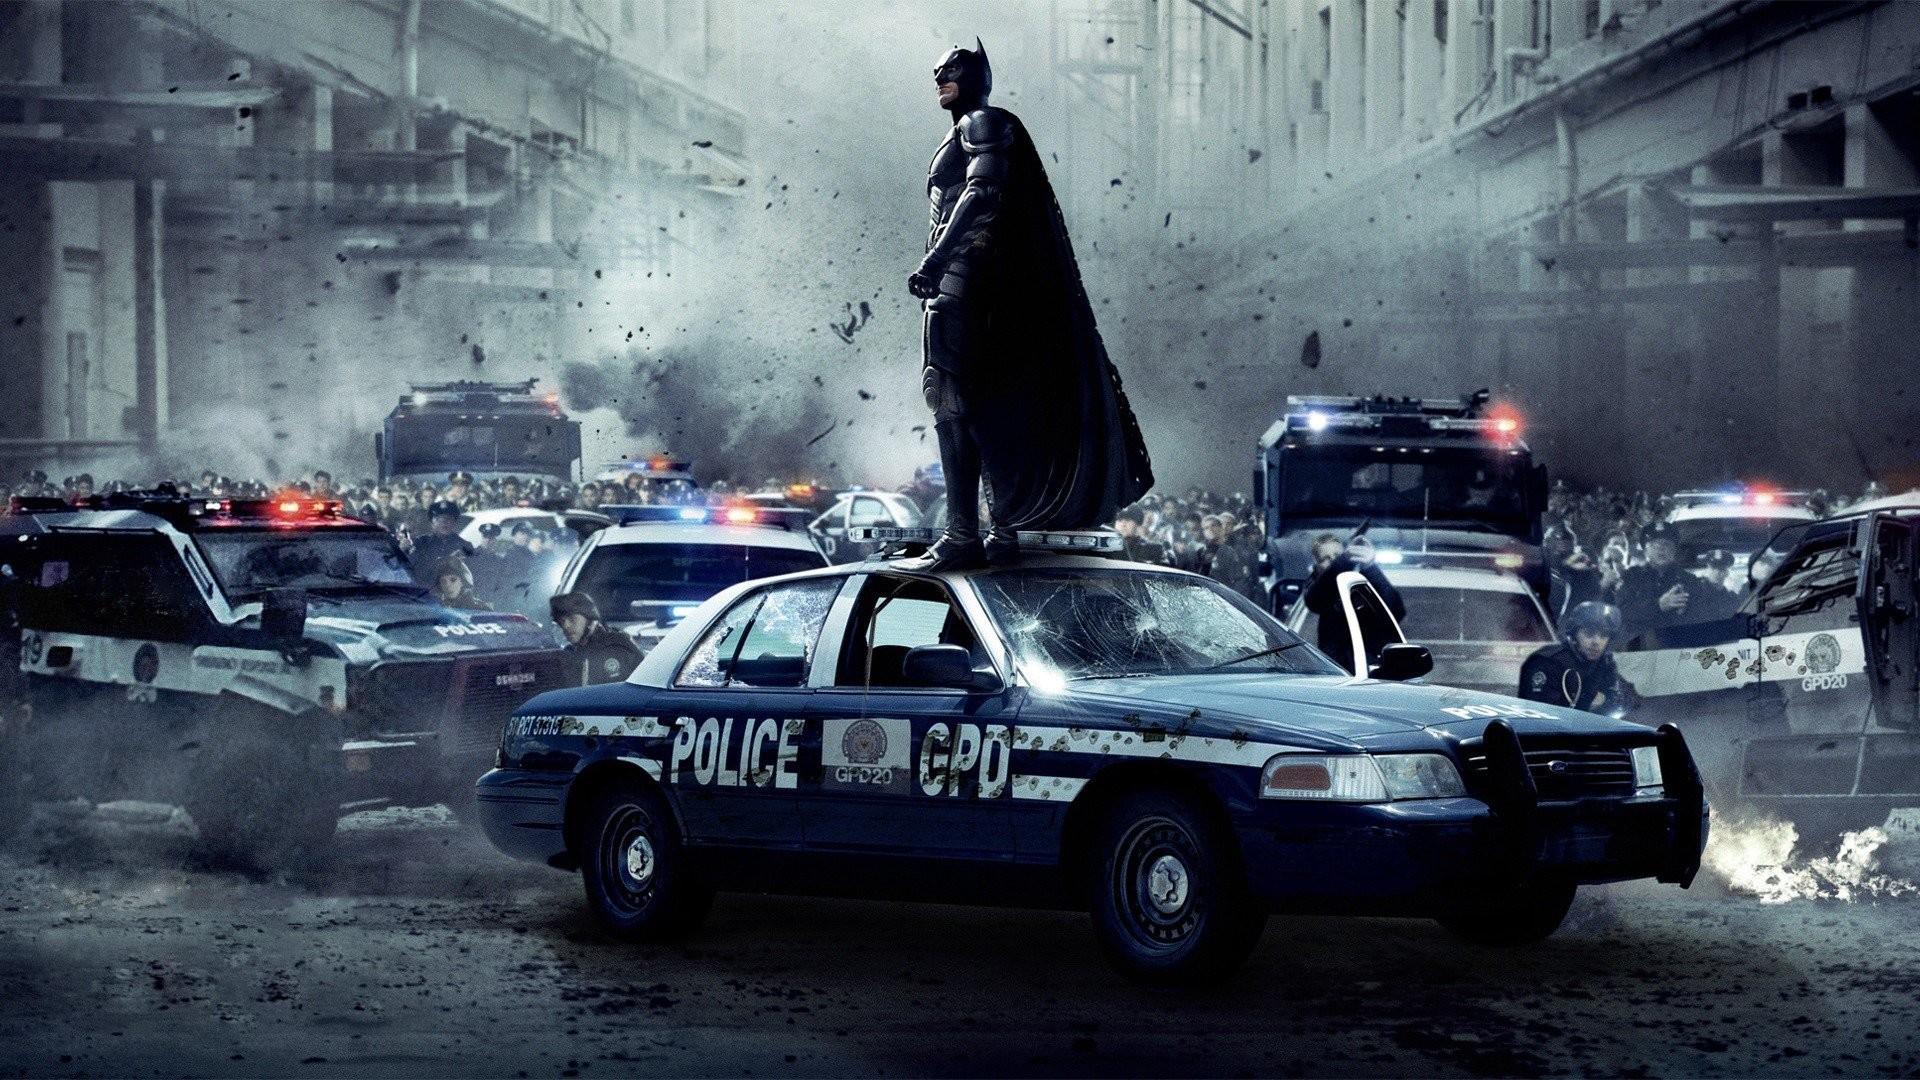 Batman The Dark Knight Rises Cars Explosions Movies Police Cruiser